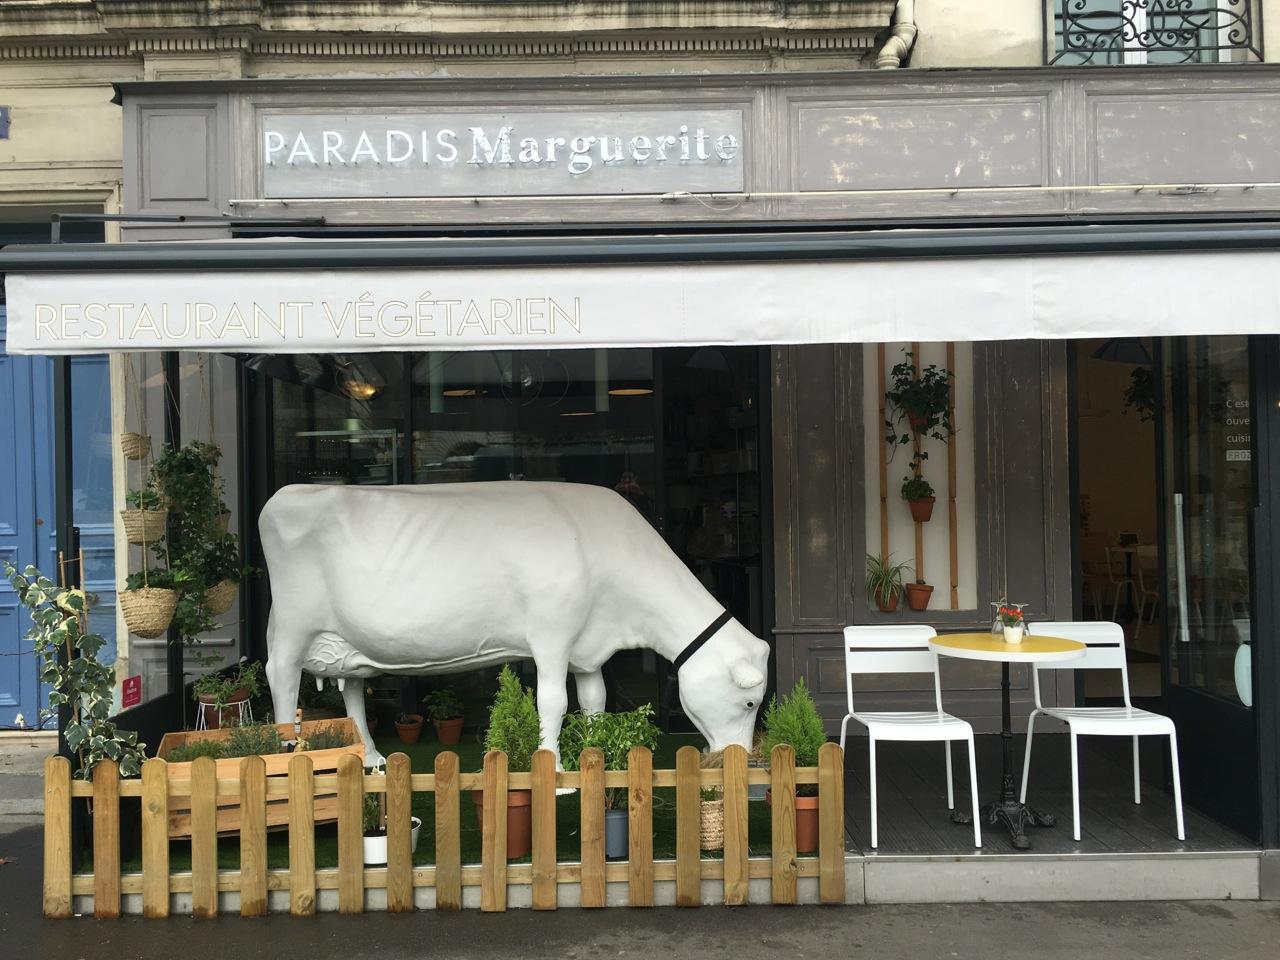 paradis marguerite restaurant v getarien the parisienne. Black Bedroom Furniture Sets. Home Design Ideas